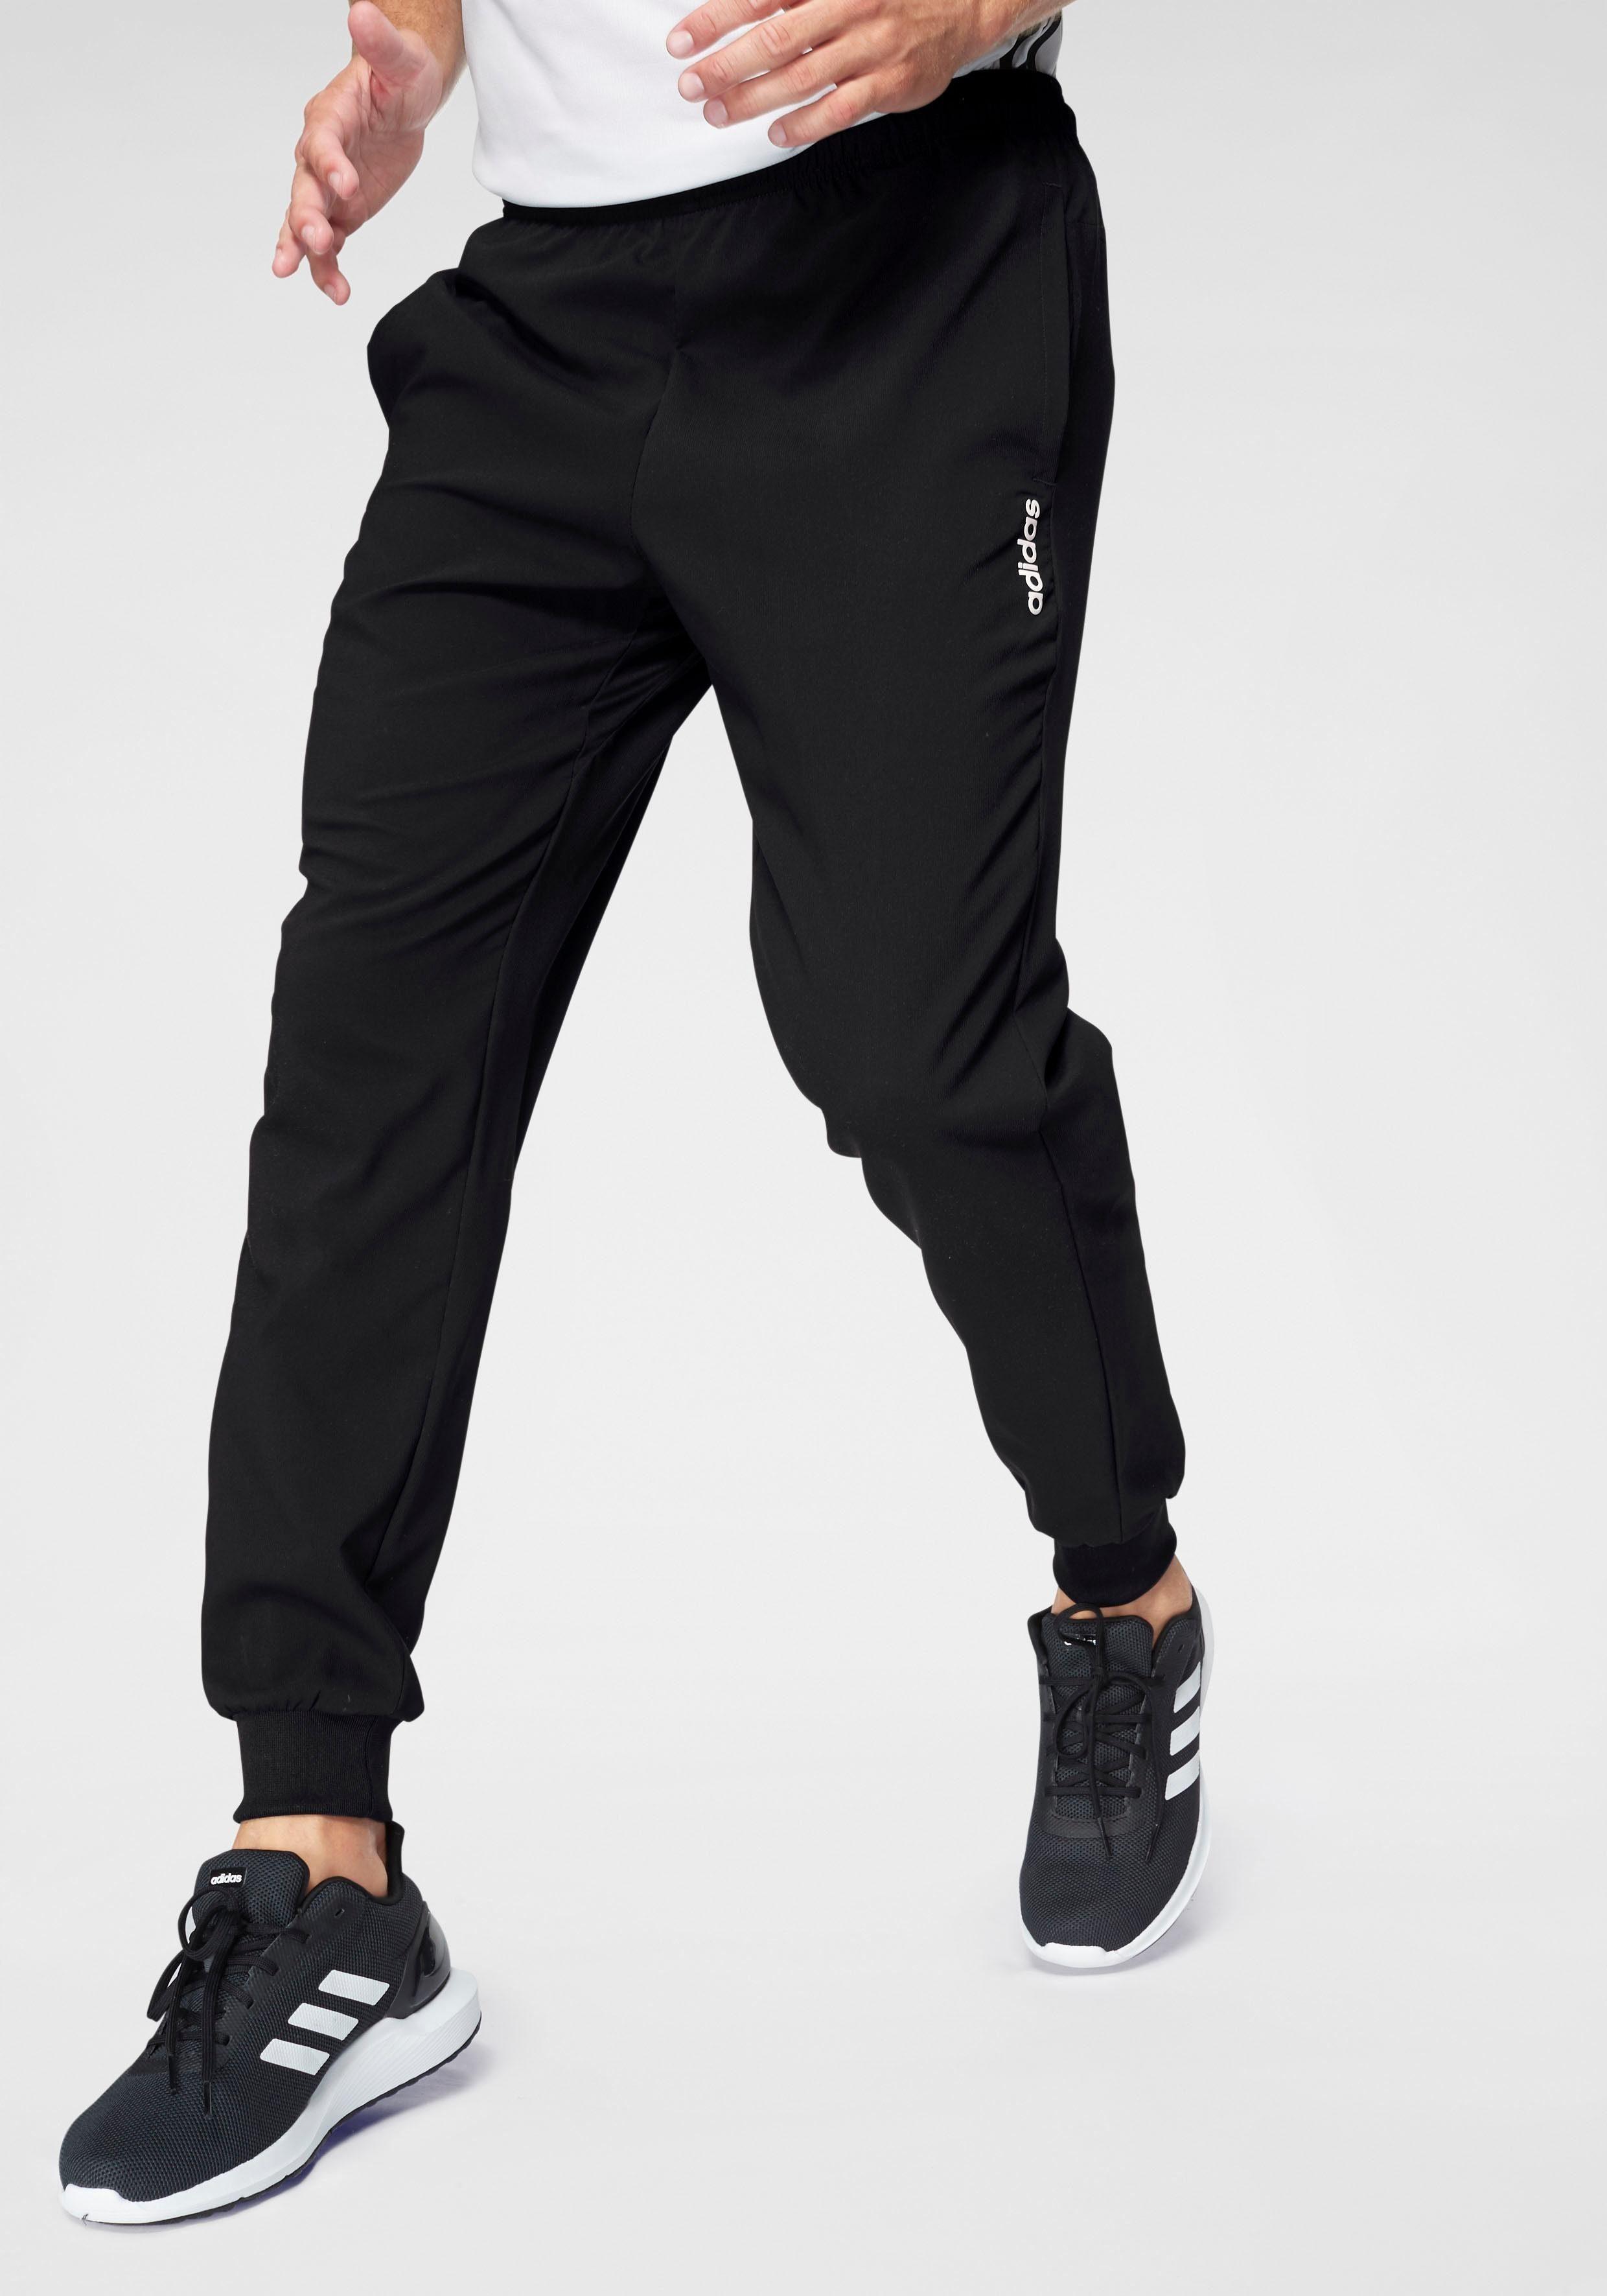 adidas Trainingshose »E PANT T STANFORD«, Logoschriftzug online kaufen | OTTO